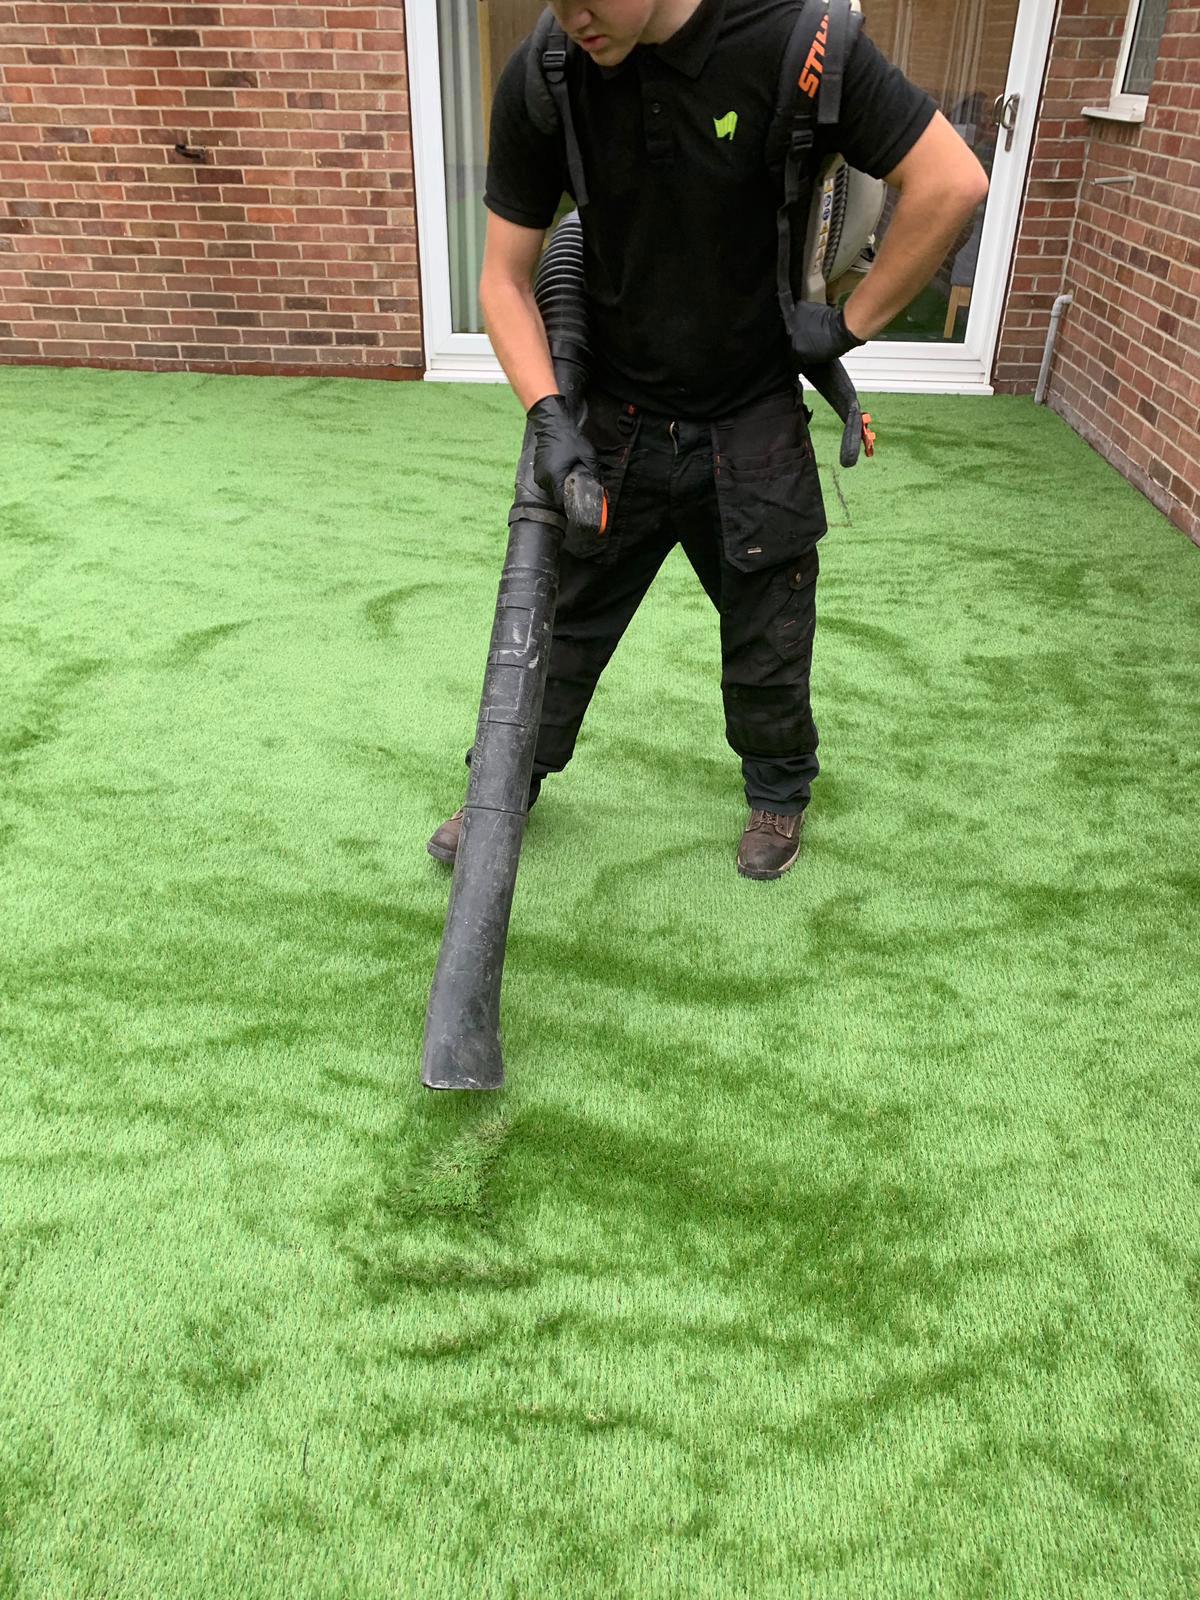 Artificial Grass For Dogs Penistone Artificial Super Grass